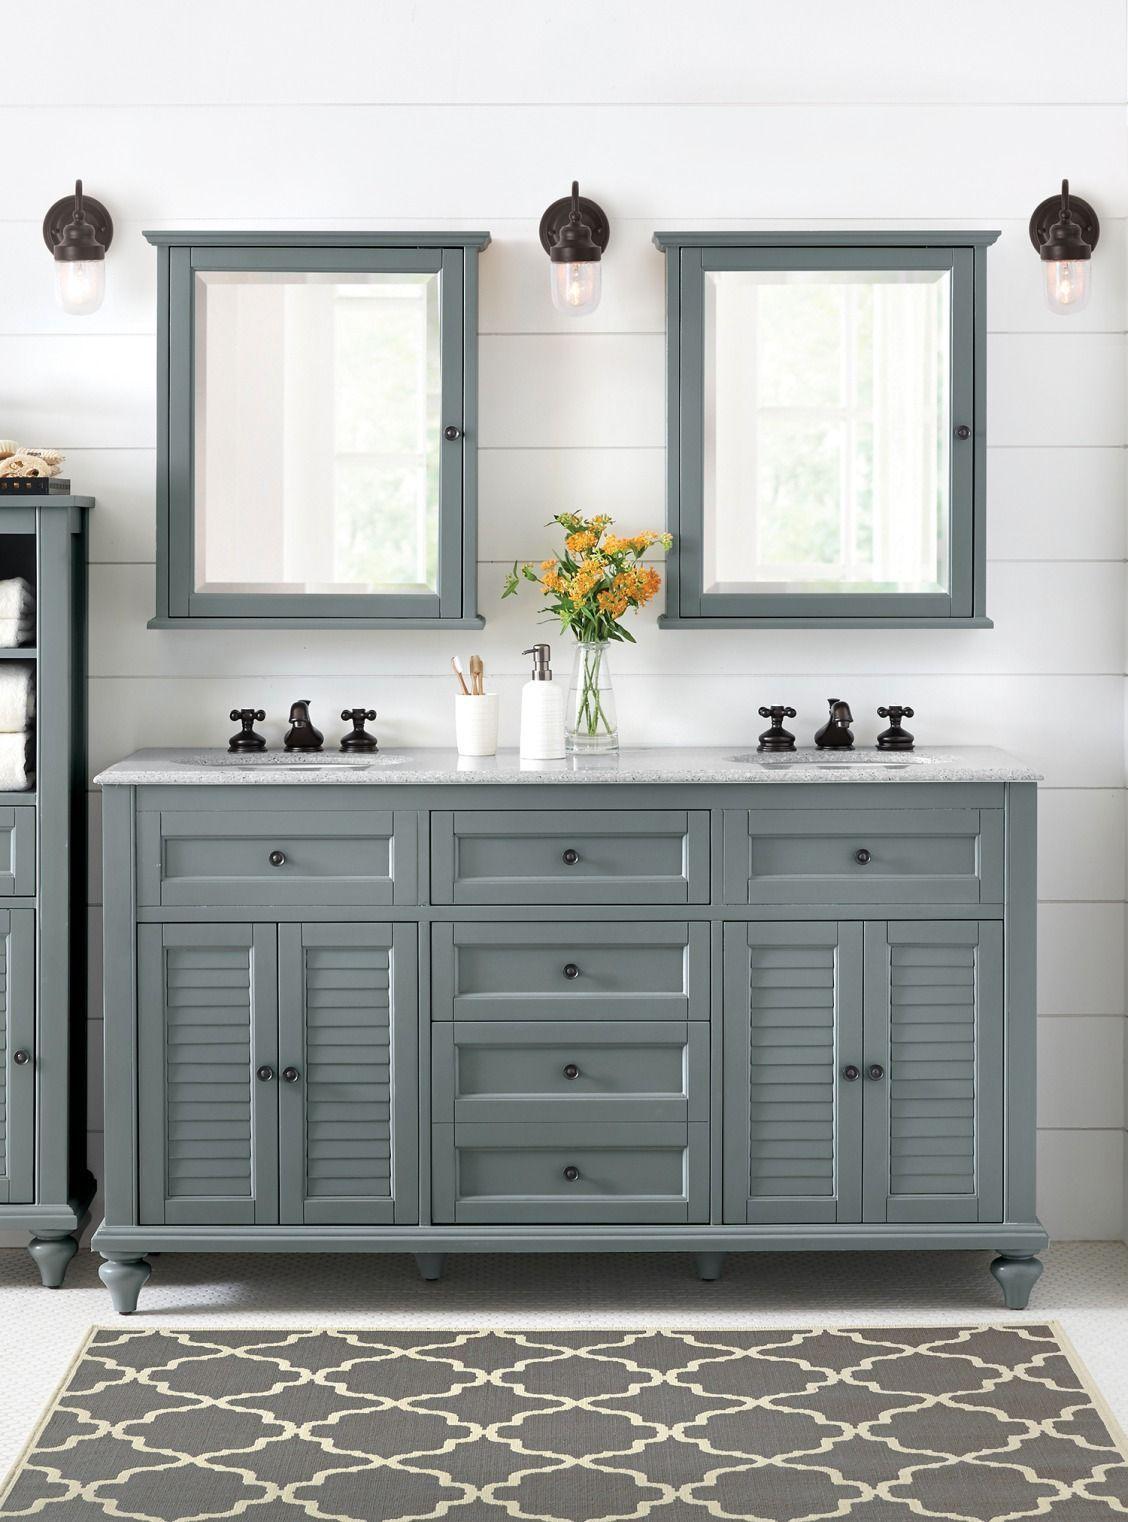 Wallartideasforlivingroom In 2020 Bathroom Vanity Designs Simple Bathroom Bathroom Remodel Master